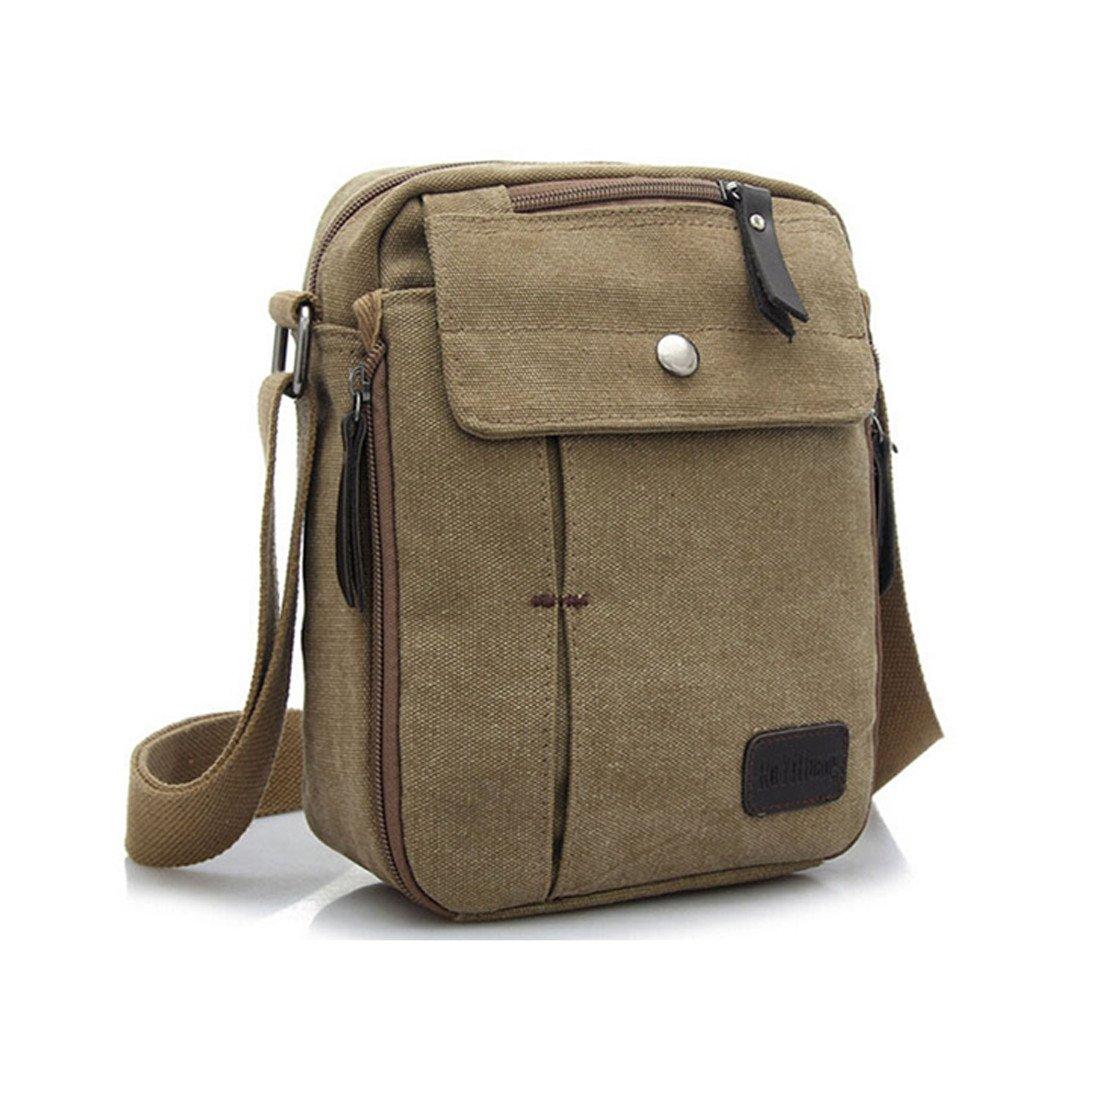 Stylish Men'S Canvas Messenger Bag